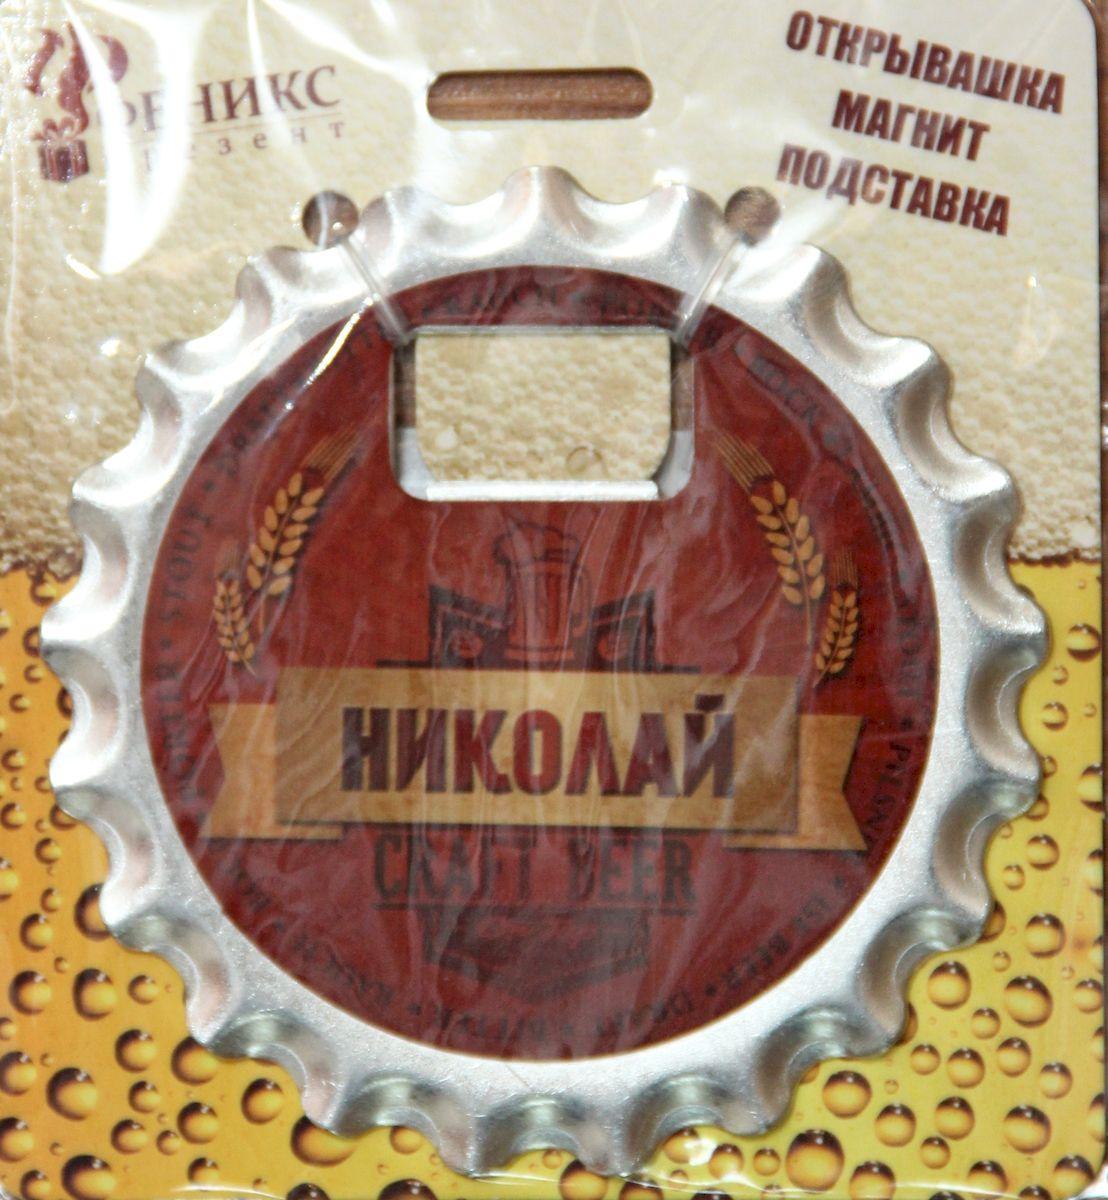 Ключ для открывания бутылок Magic Home Николай, с магнитом ключ для открывания бутылок magic home авиатор с магнитом